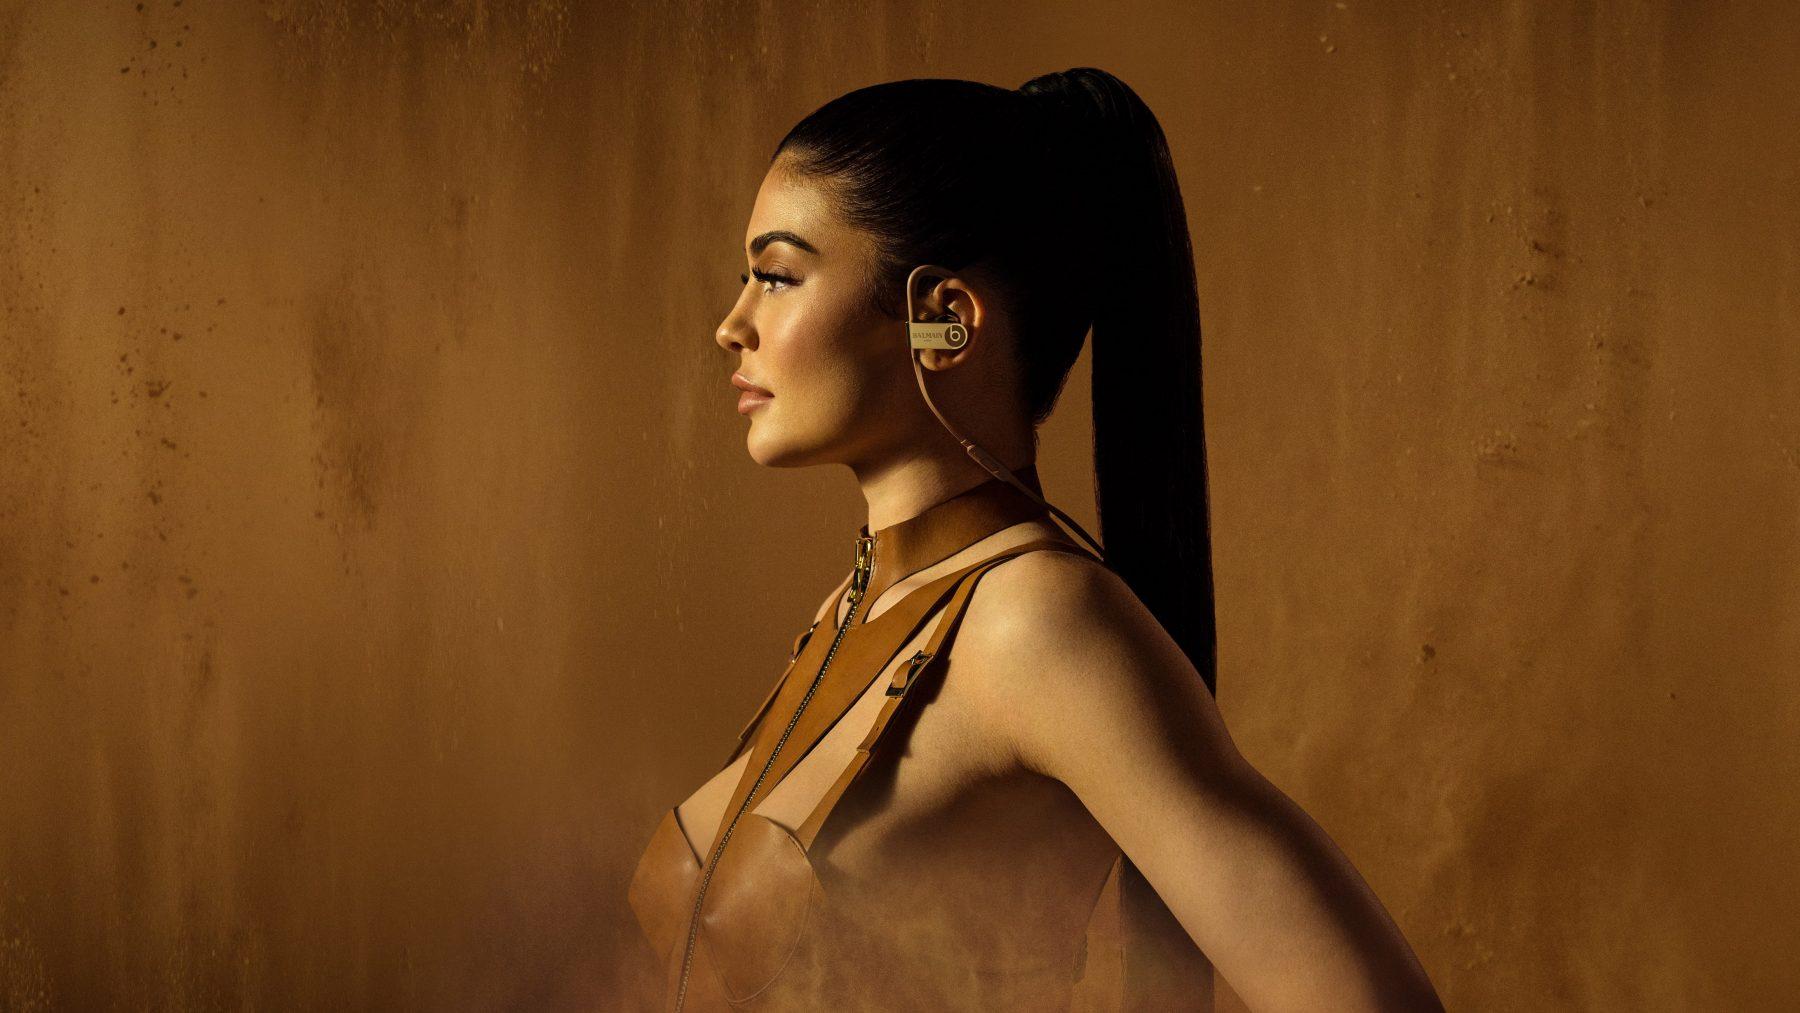 Kylie Jenner Hd Wallpapers 7wallpapers Net